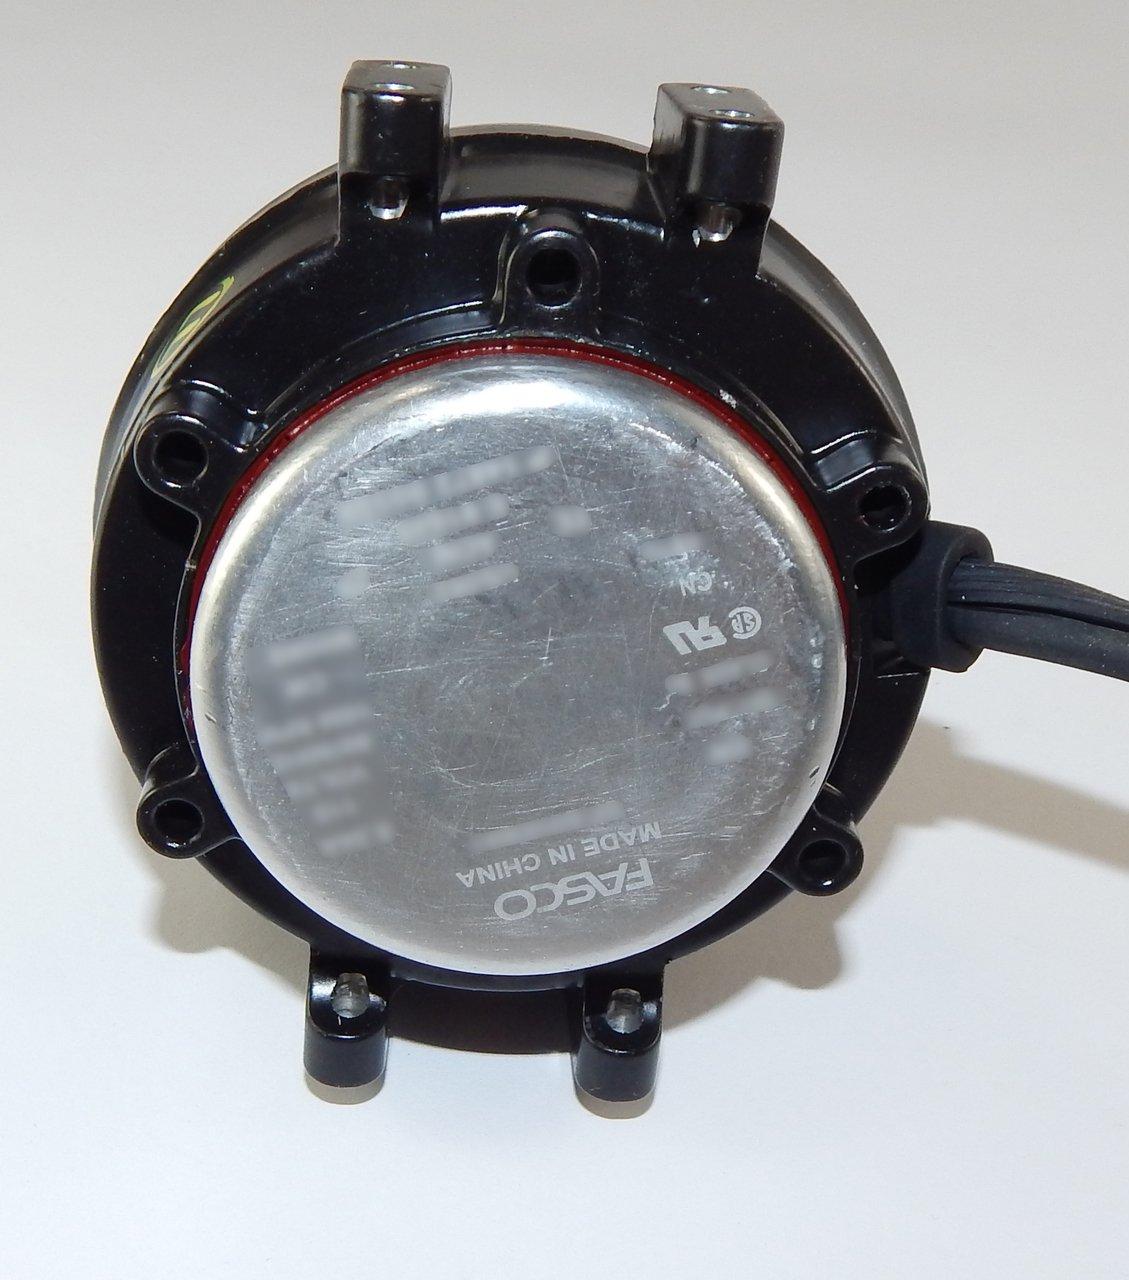 5 Watt 1550 RPM CWLE 115V Unit Bearing Refrigeration Electric Motor Fasco UB582